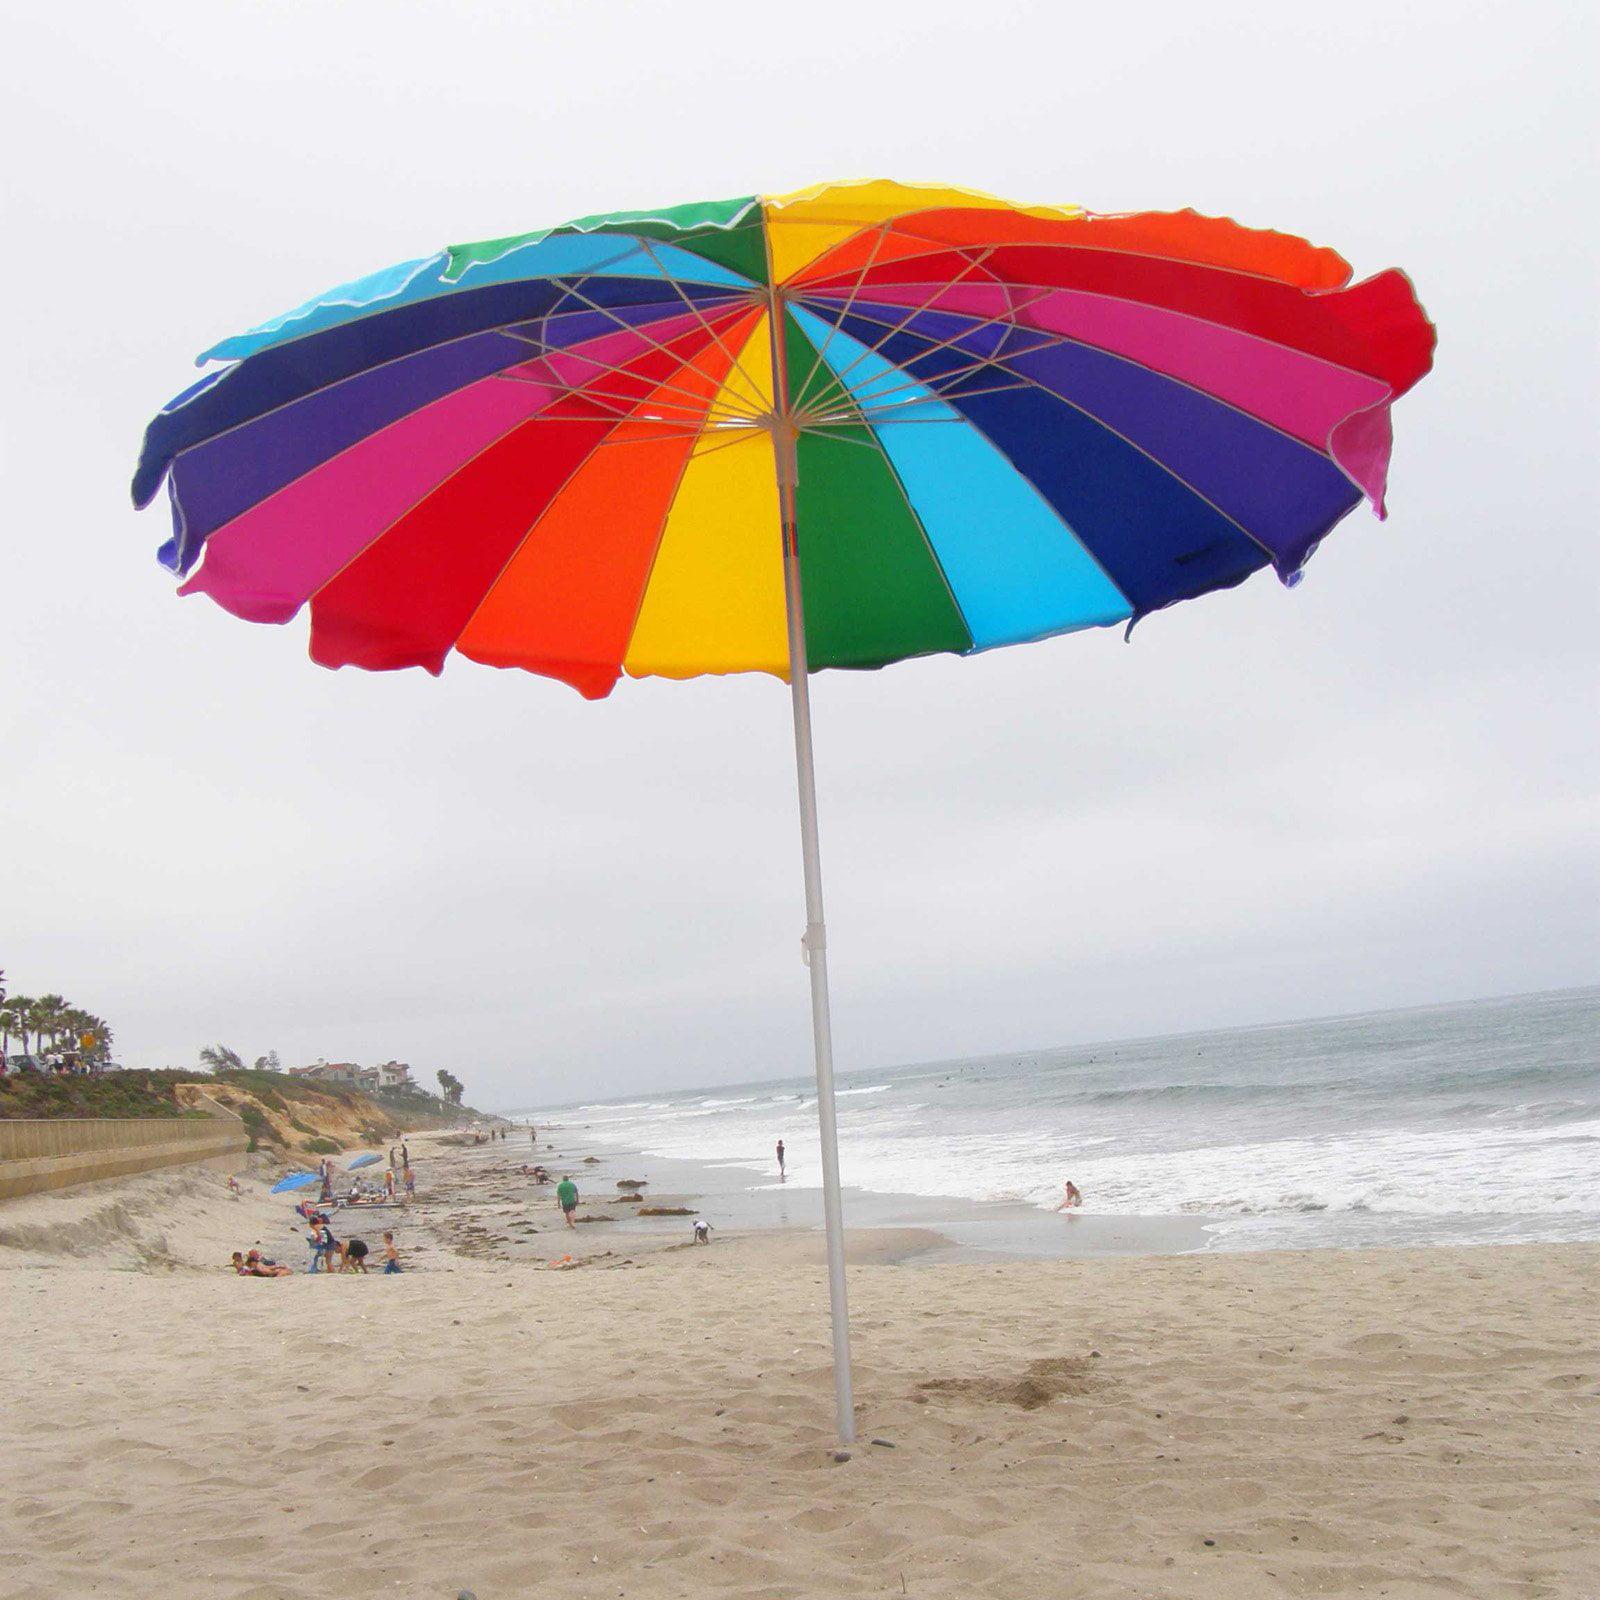 Impact Canopy 8 Ft Rainbow Beach Umbrella With Carry Bag Sand Anchor Auger